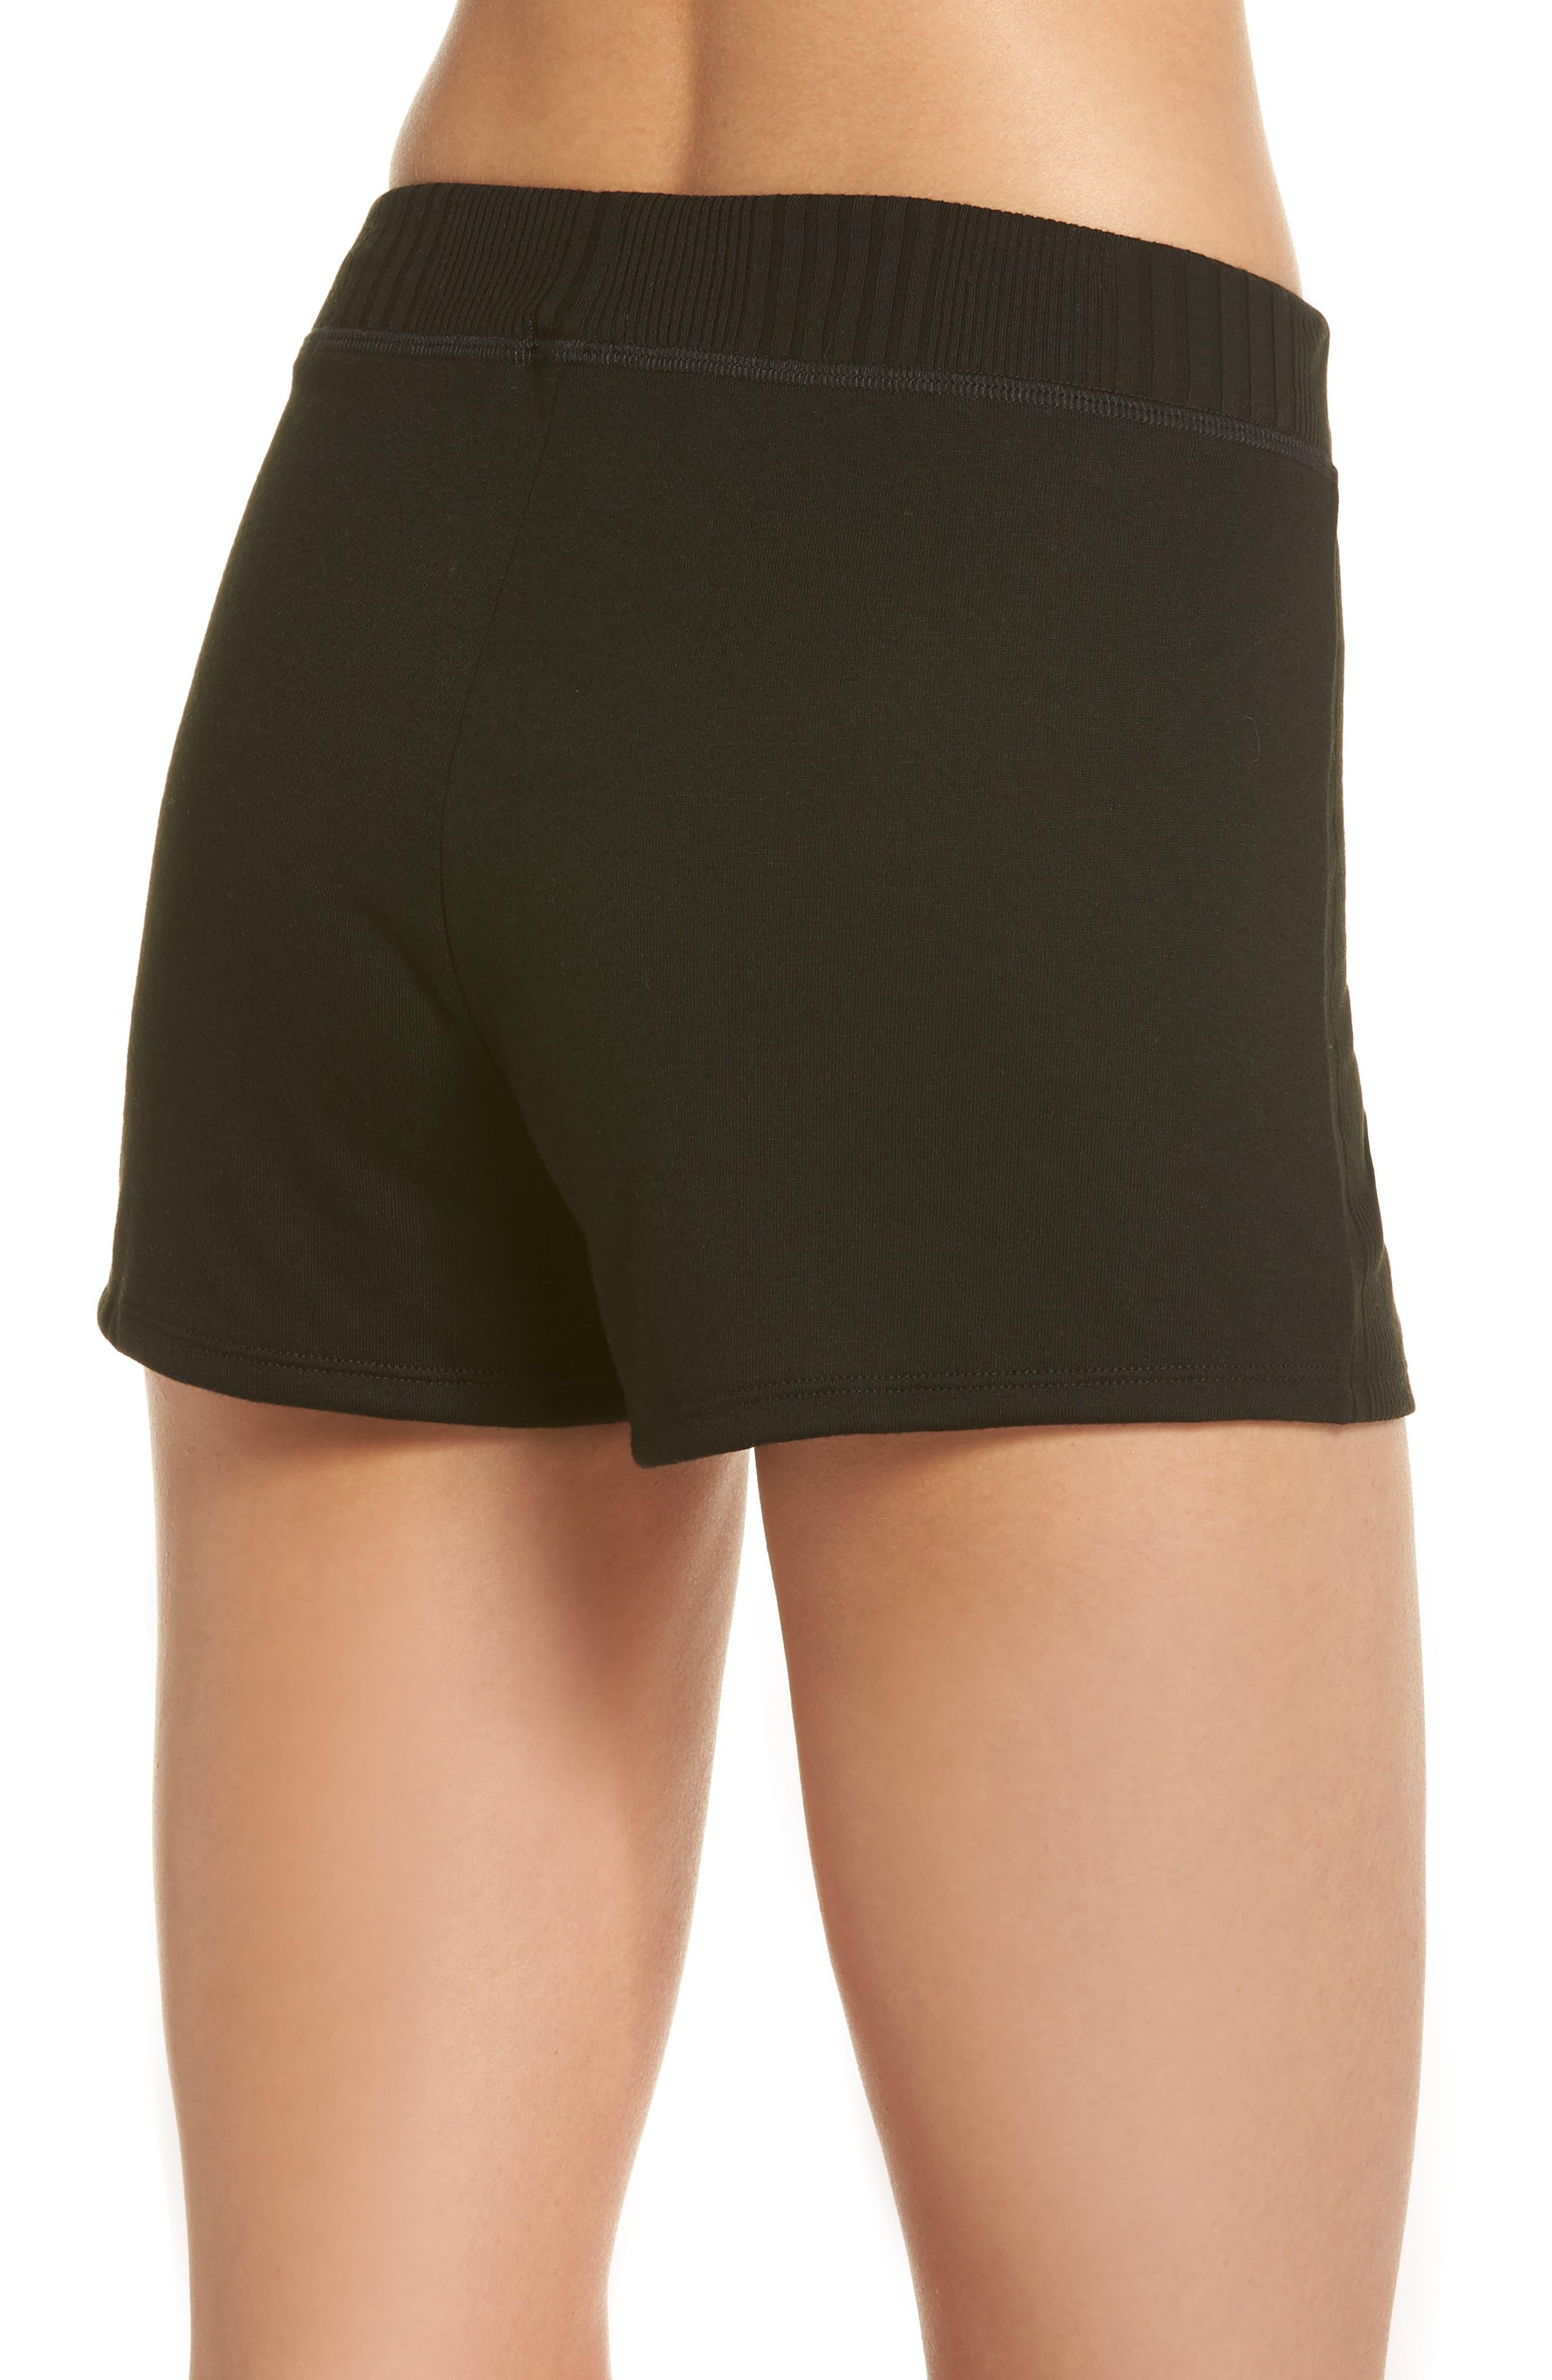 Pajama Shorts,                             Alternate thumbnail 2, color,                             Black